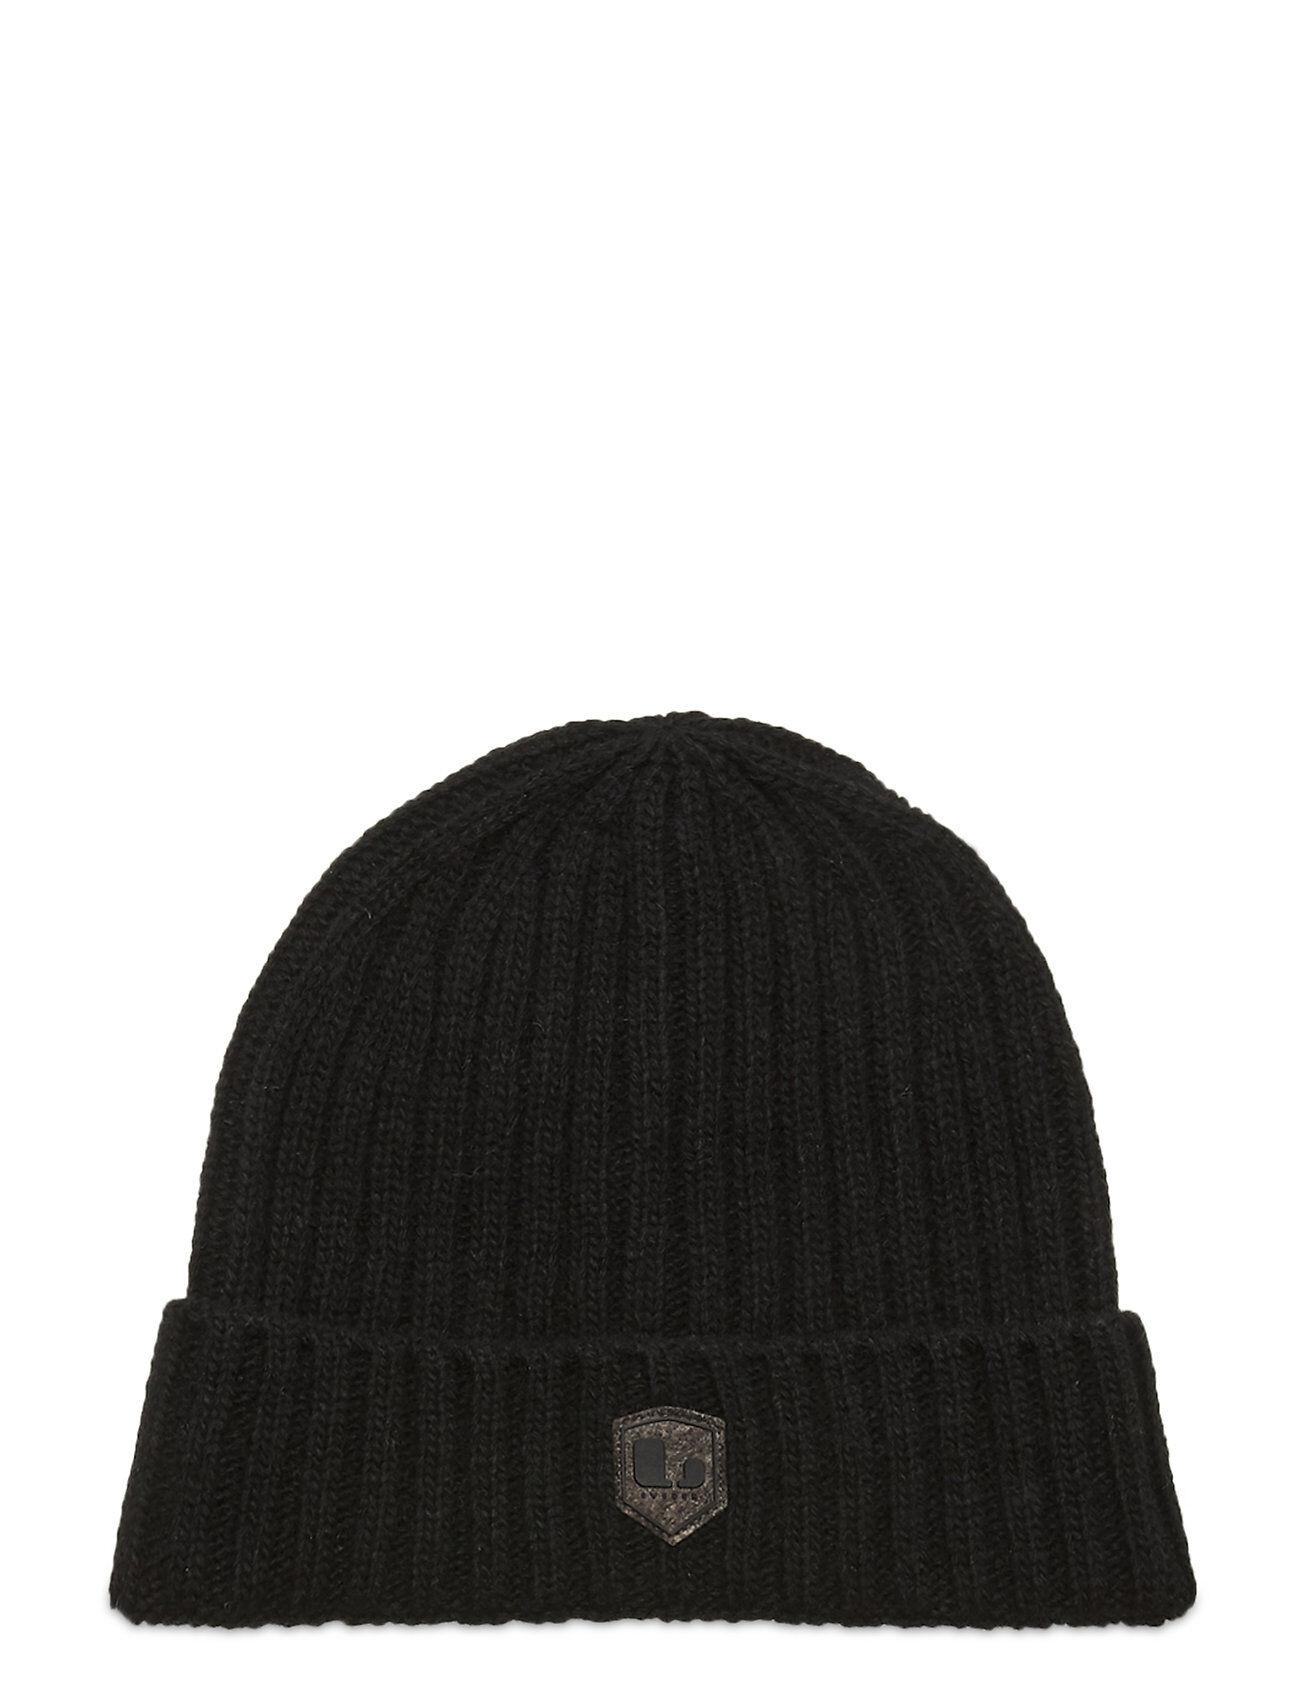 Lindberg Sweden Stockholm Hat Accessories Headwear Hats Musta Lindberg Sweden